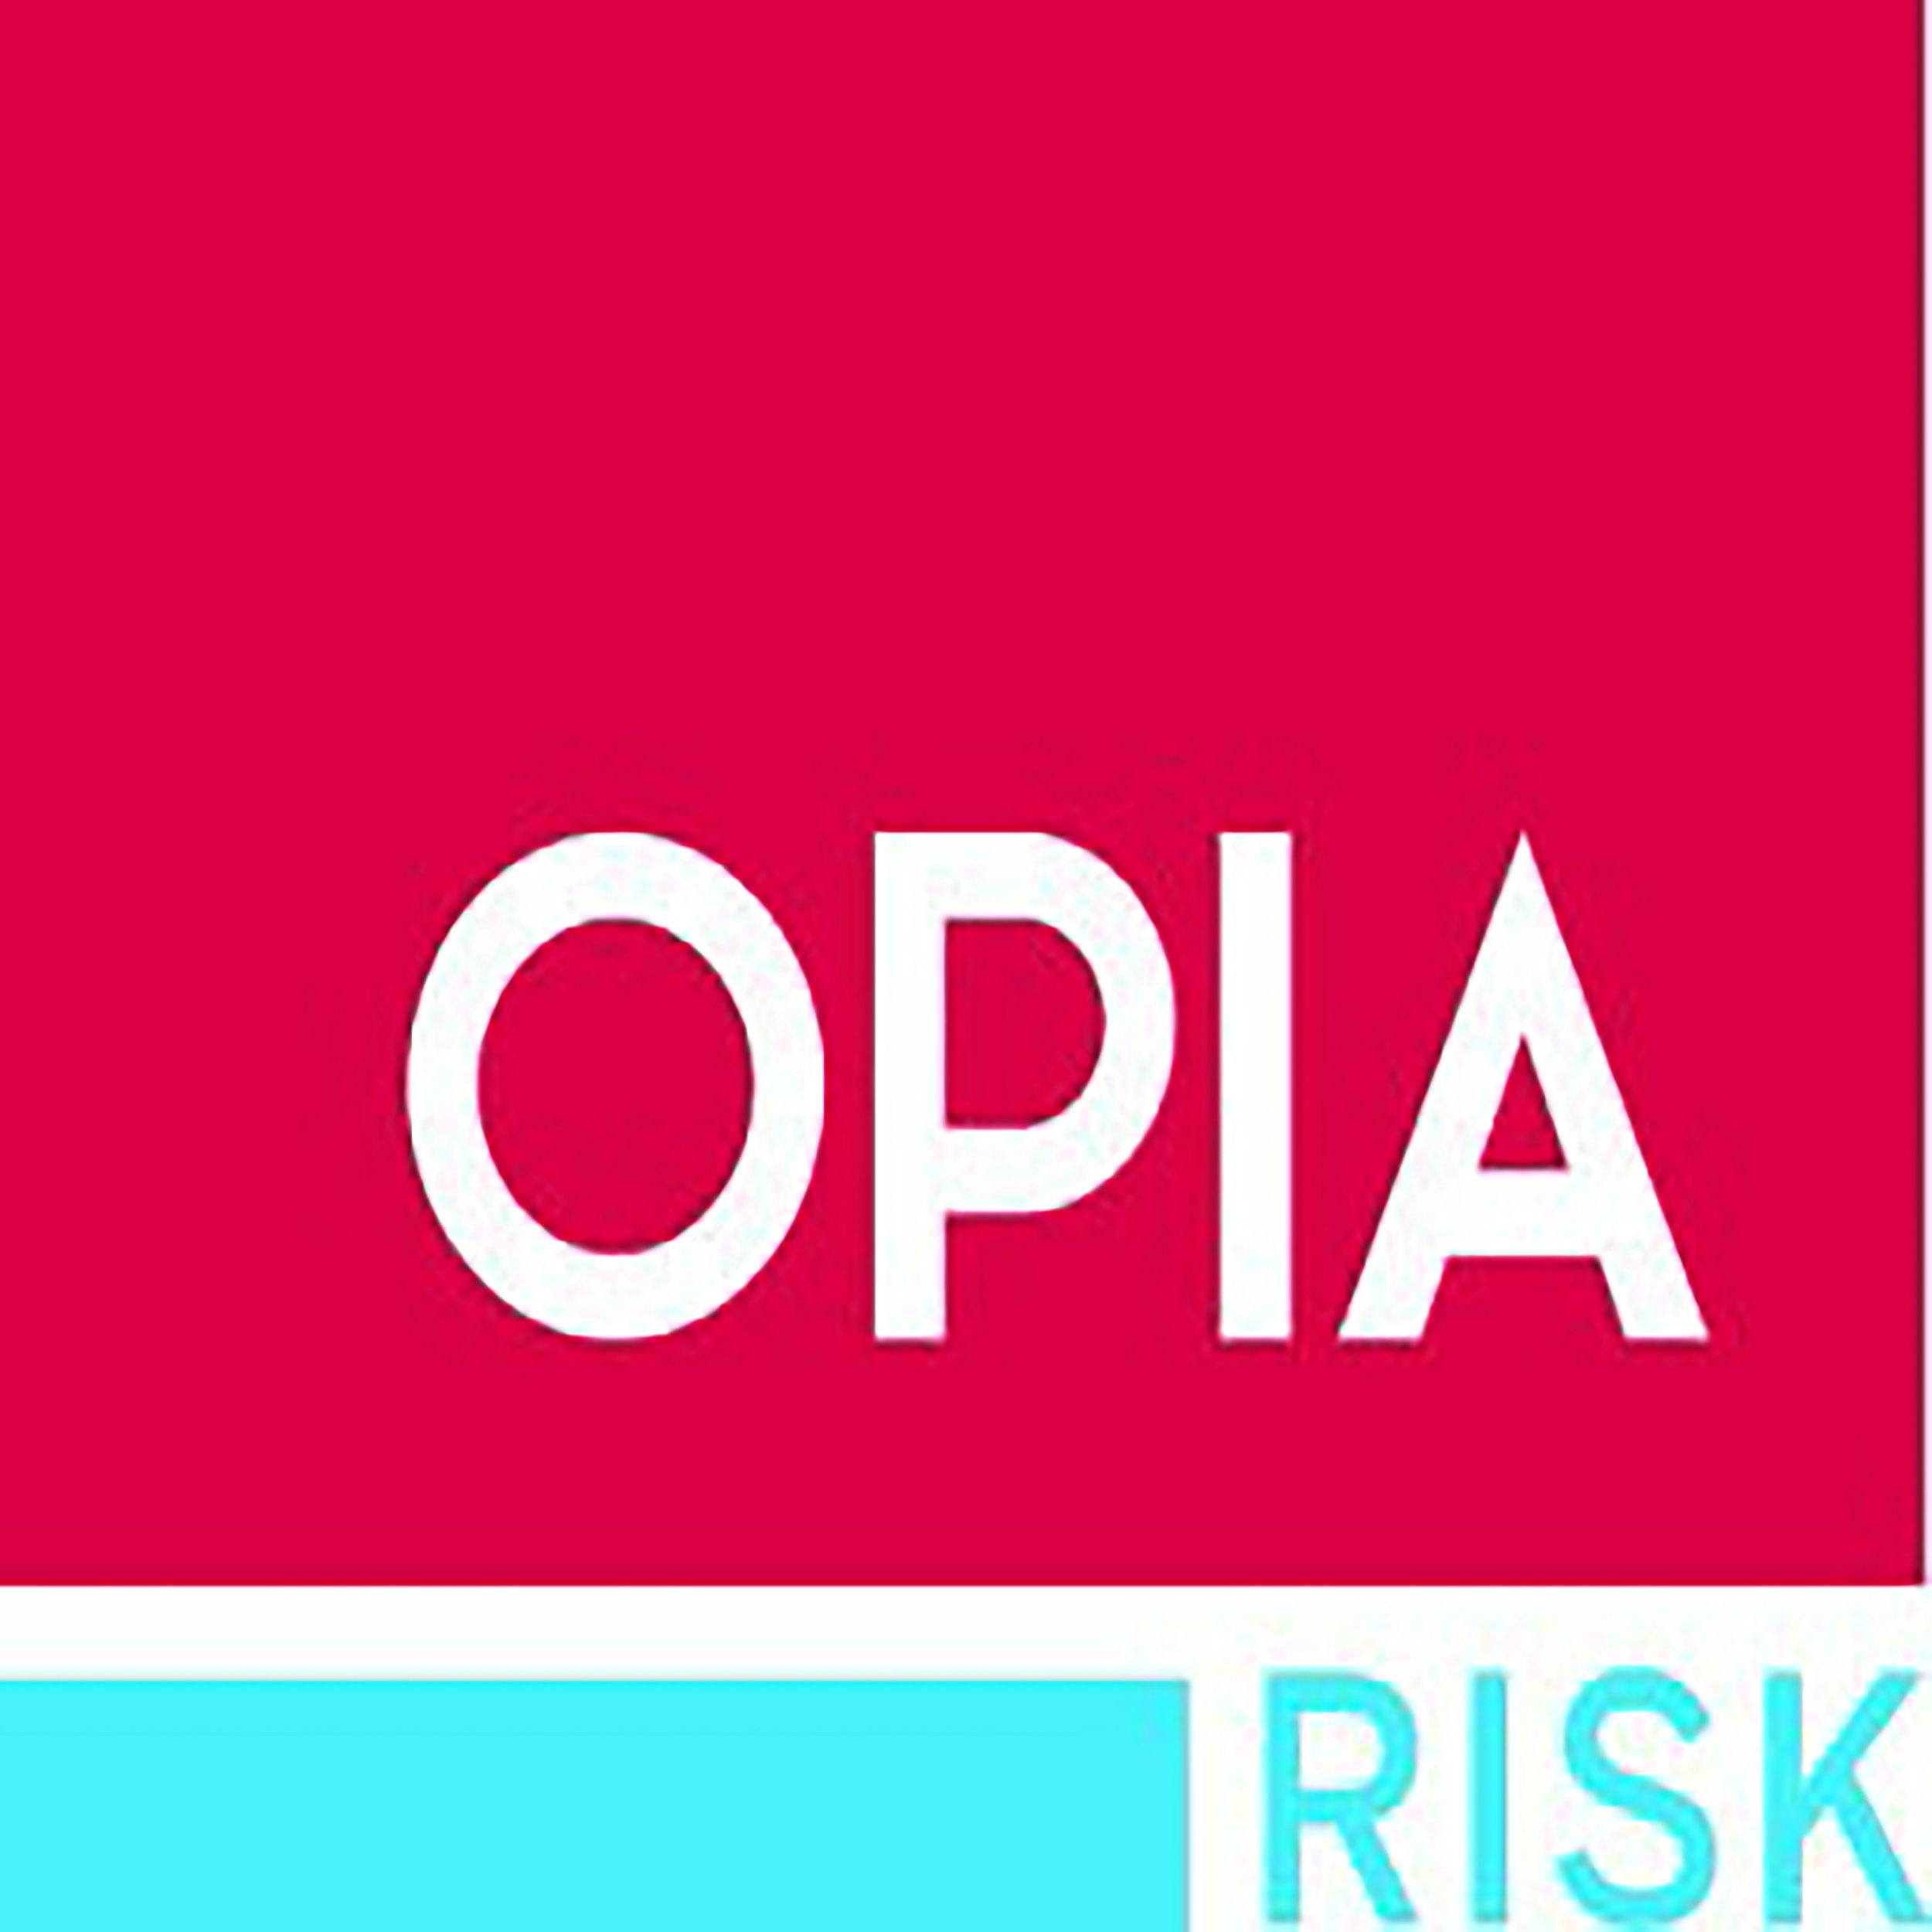 thumbnail_OPI1386_Opia+Sub+Branding_final+logo_CMYK.jpg